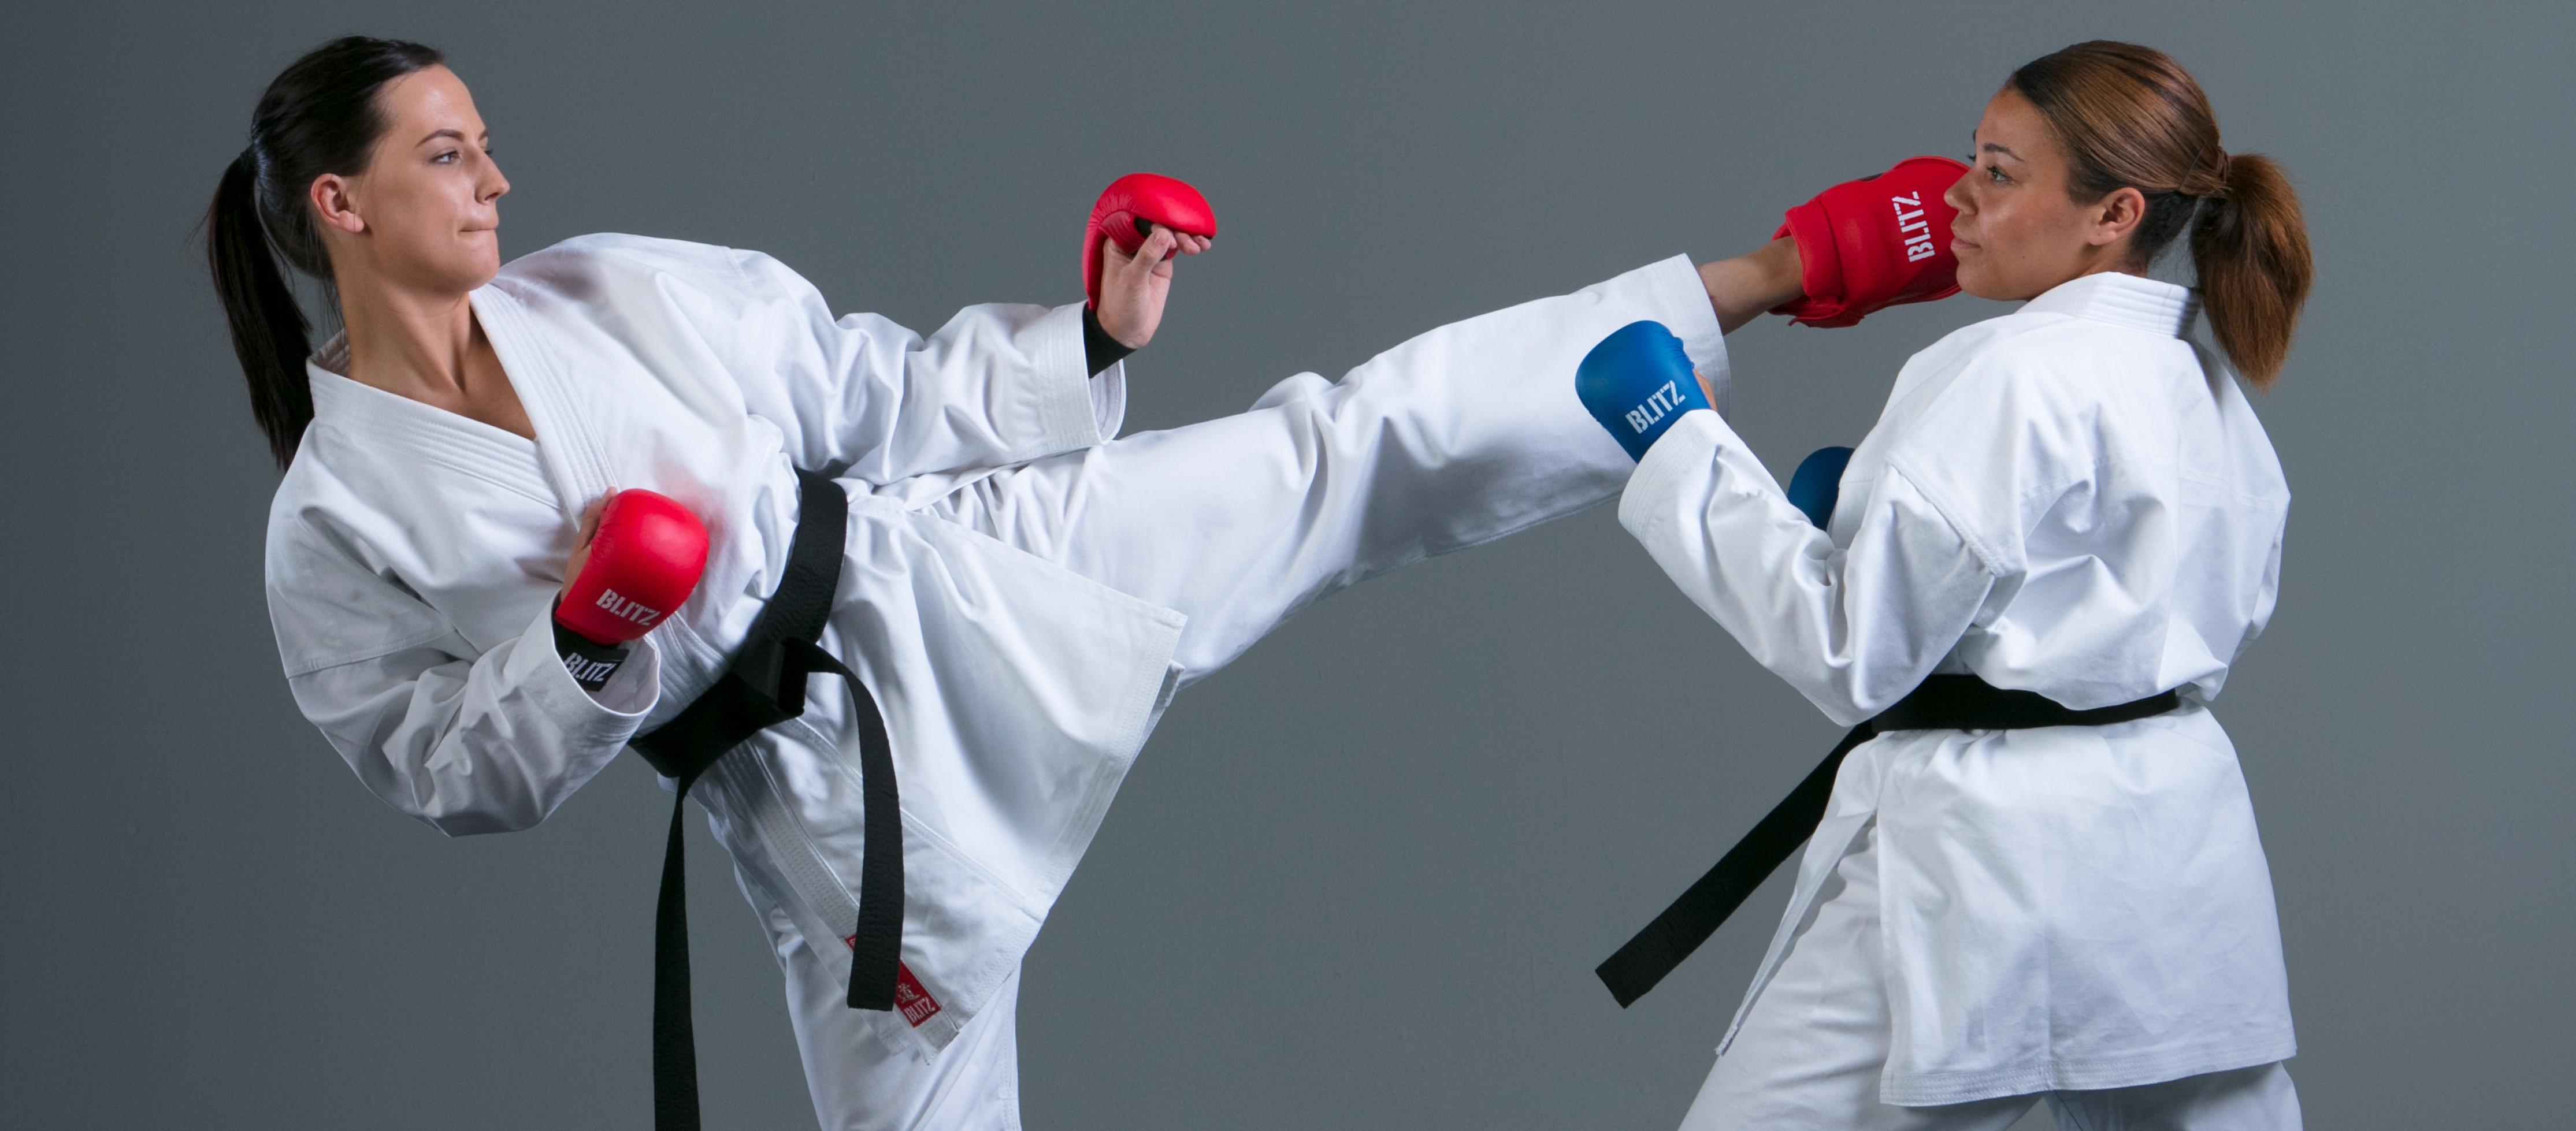 Karate Kicks: How to Improve Your Technique - Blitz Blog